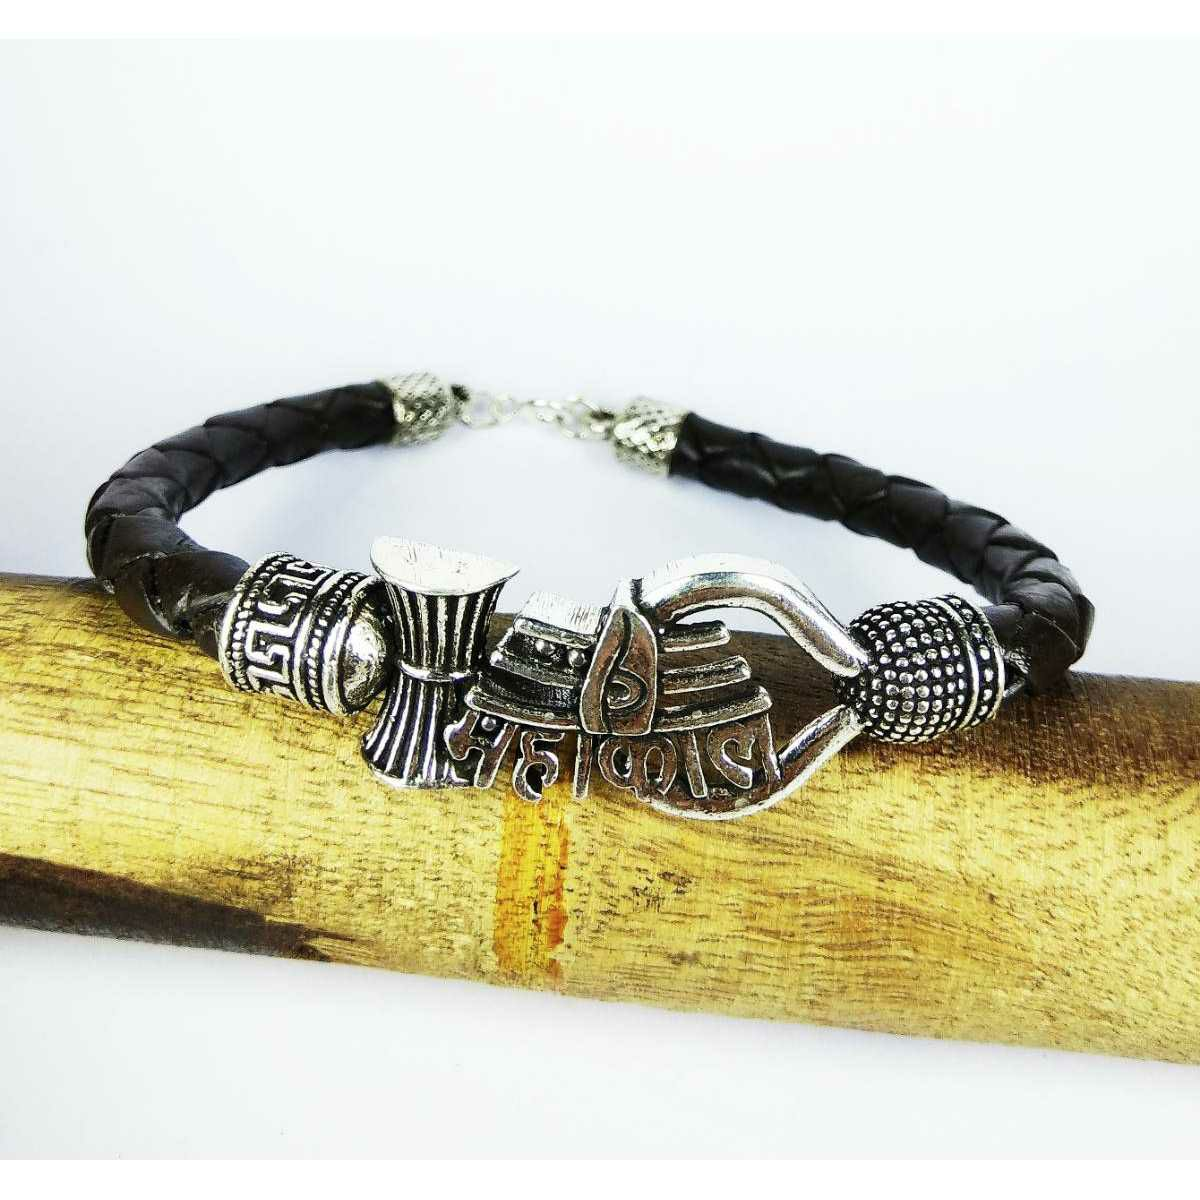 Descent light weight 925 silver black leather mahakal gents bracelet